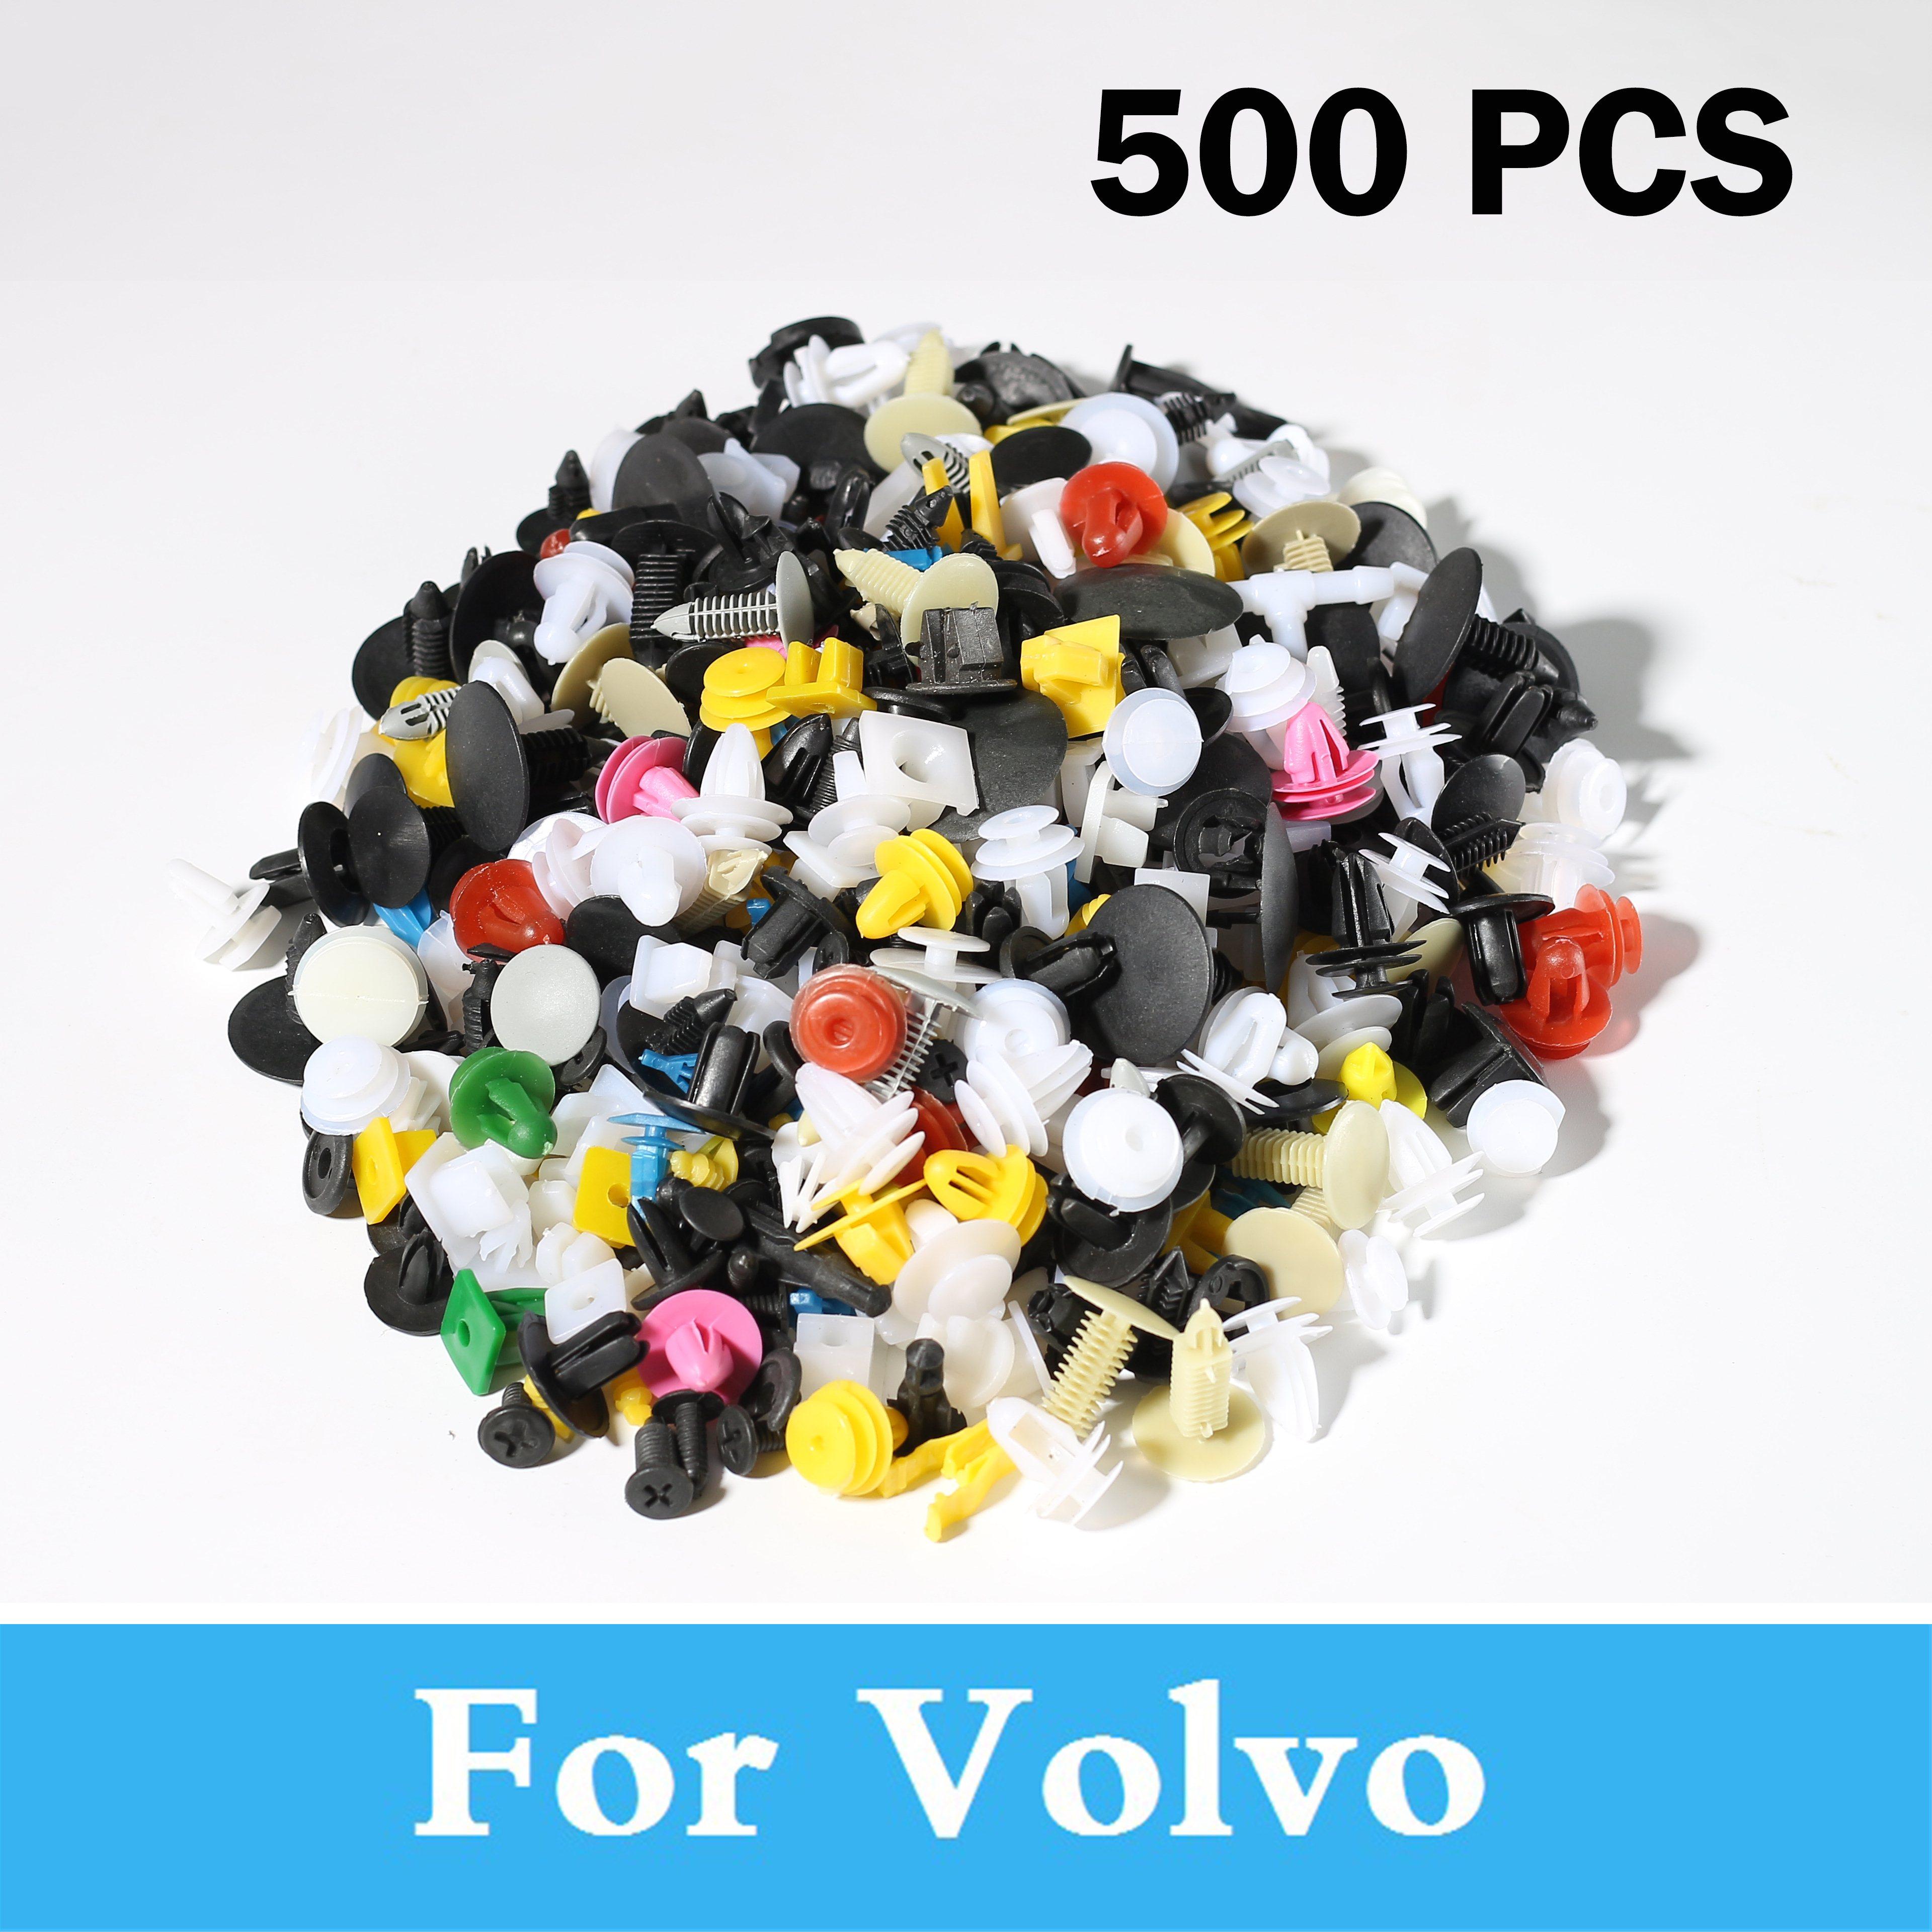 500 stücke Gemischt Auto Stoßstange Clips Verschluss Niet Tür Für Volvo S40 S60 S80 Xc90 C30 C70 V40 V50 V60 Kreuz Land V70 Xc60 Xc70